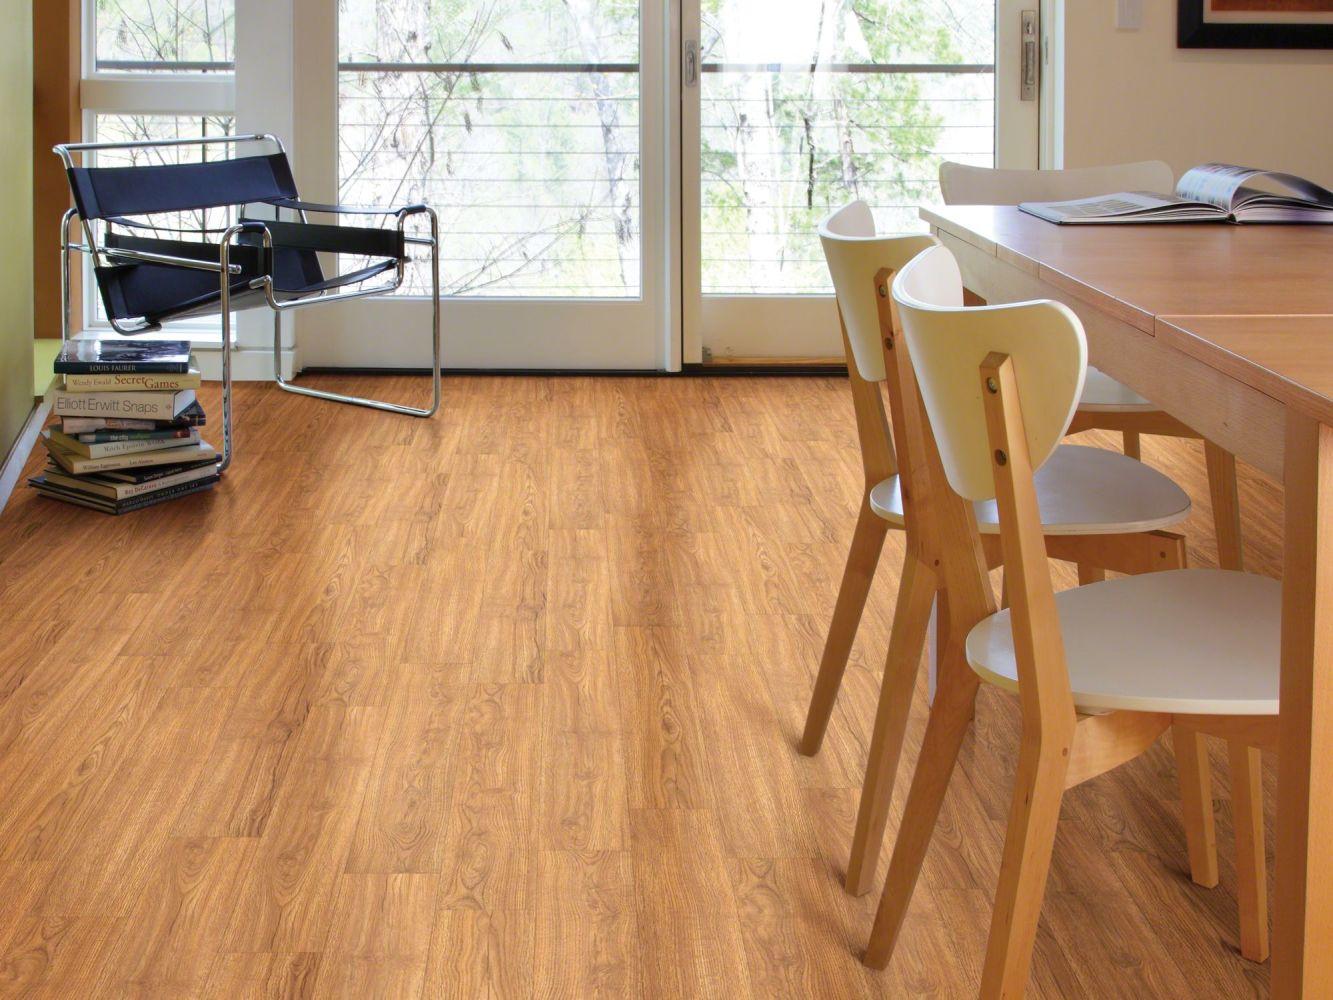 Shaw Floors Vinyl Property Solutions Market Square 6 Sweet Auburn 00260_VPS23